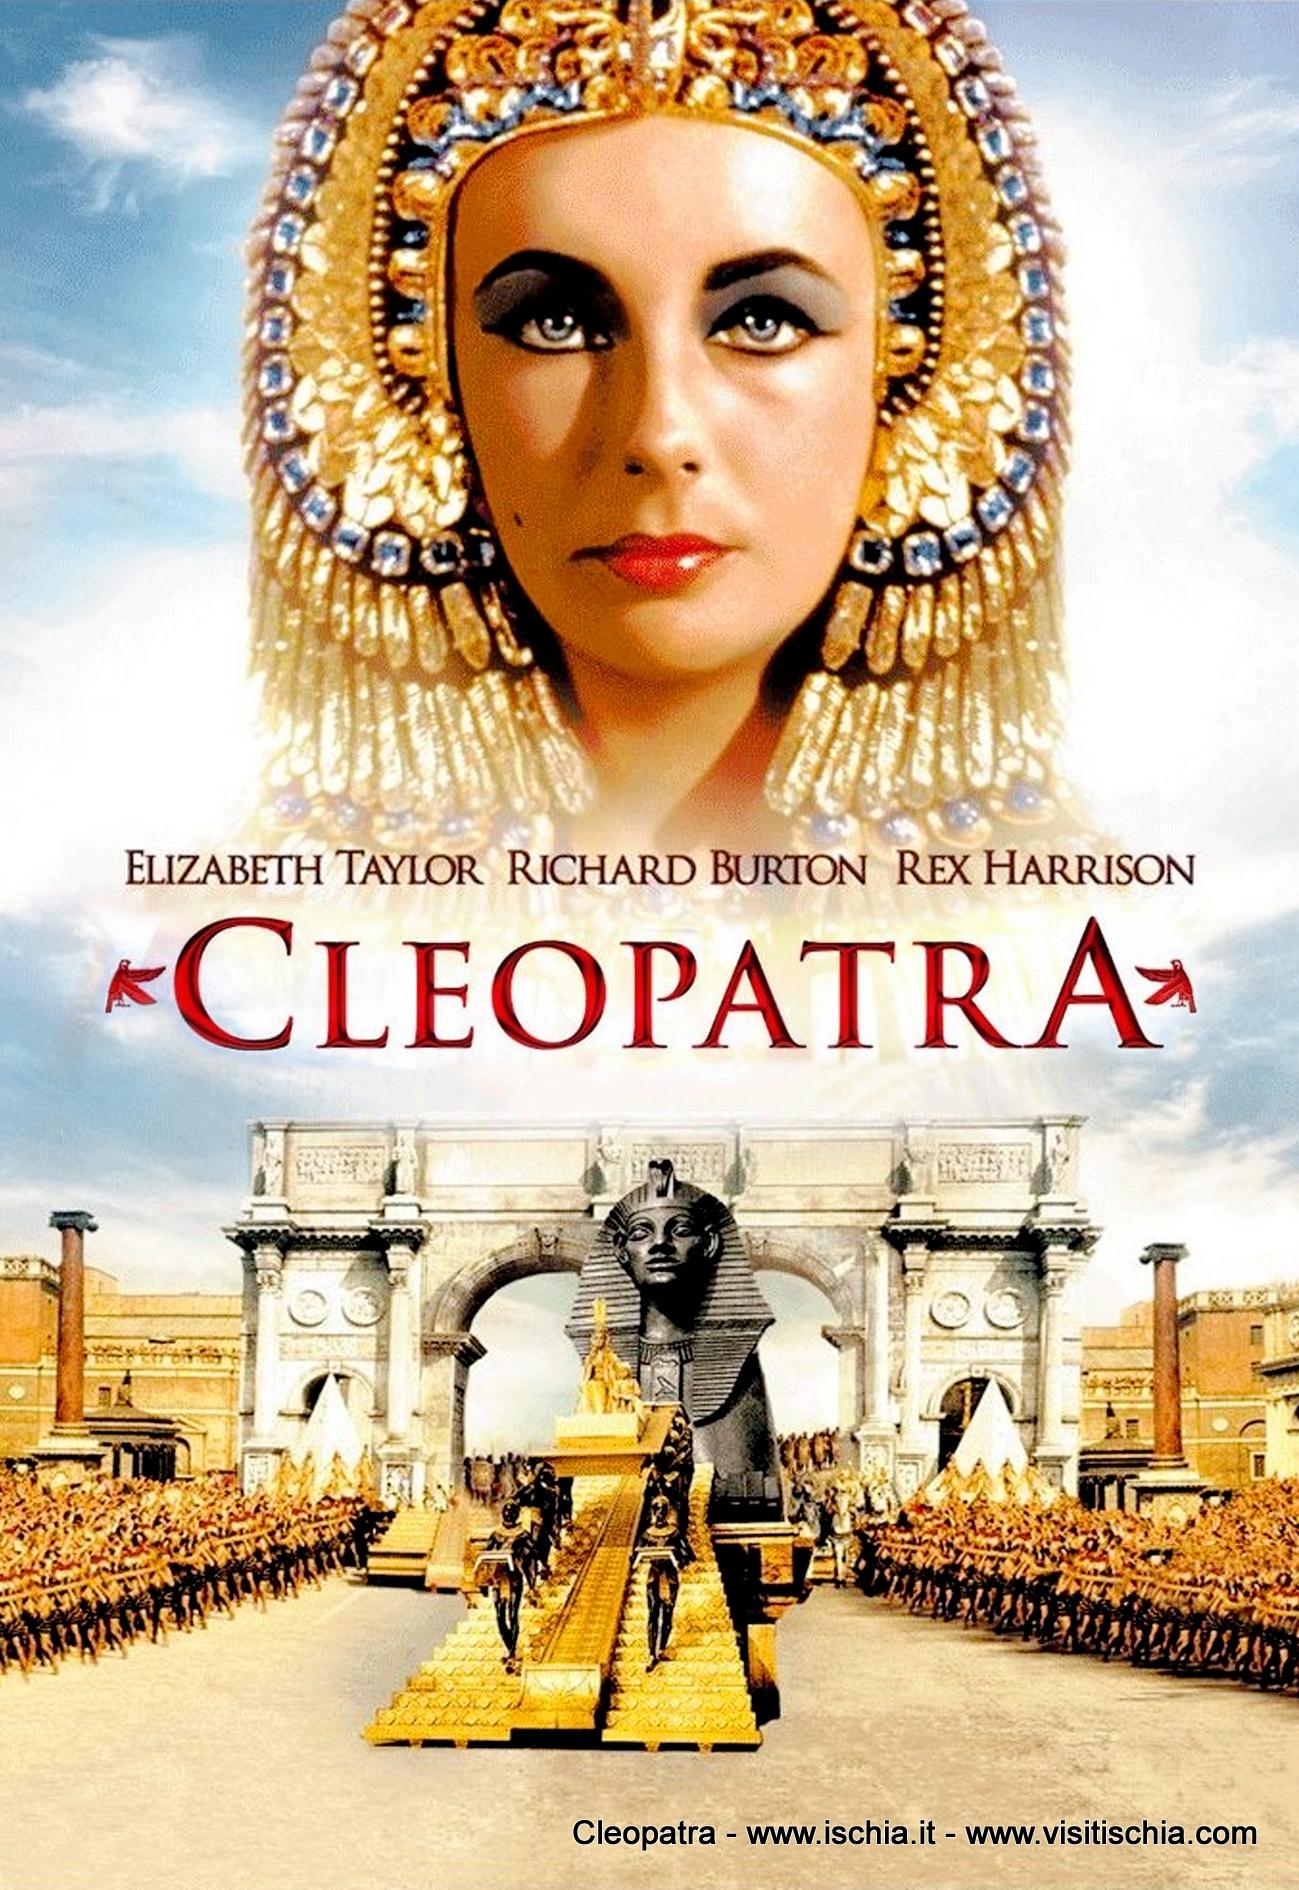 Ischia It English Cleopatra